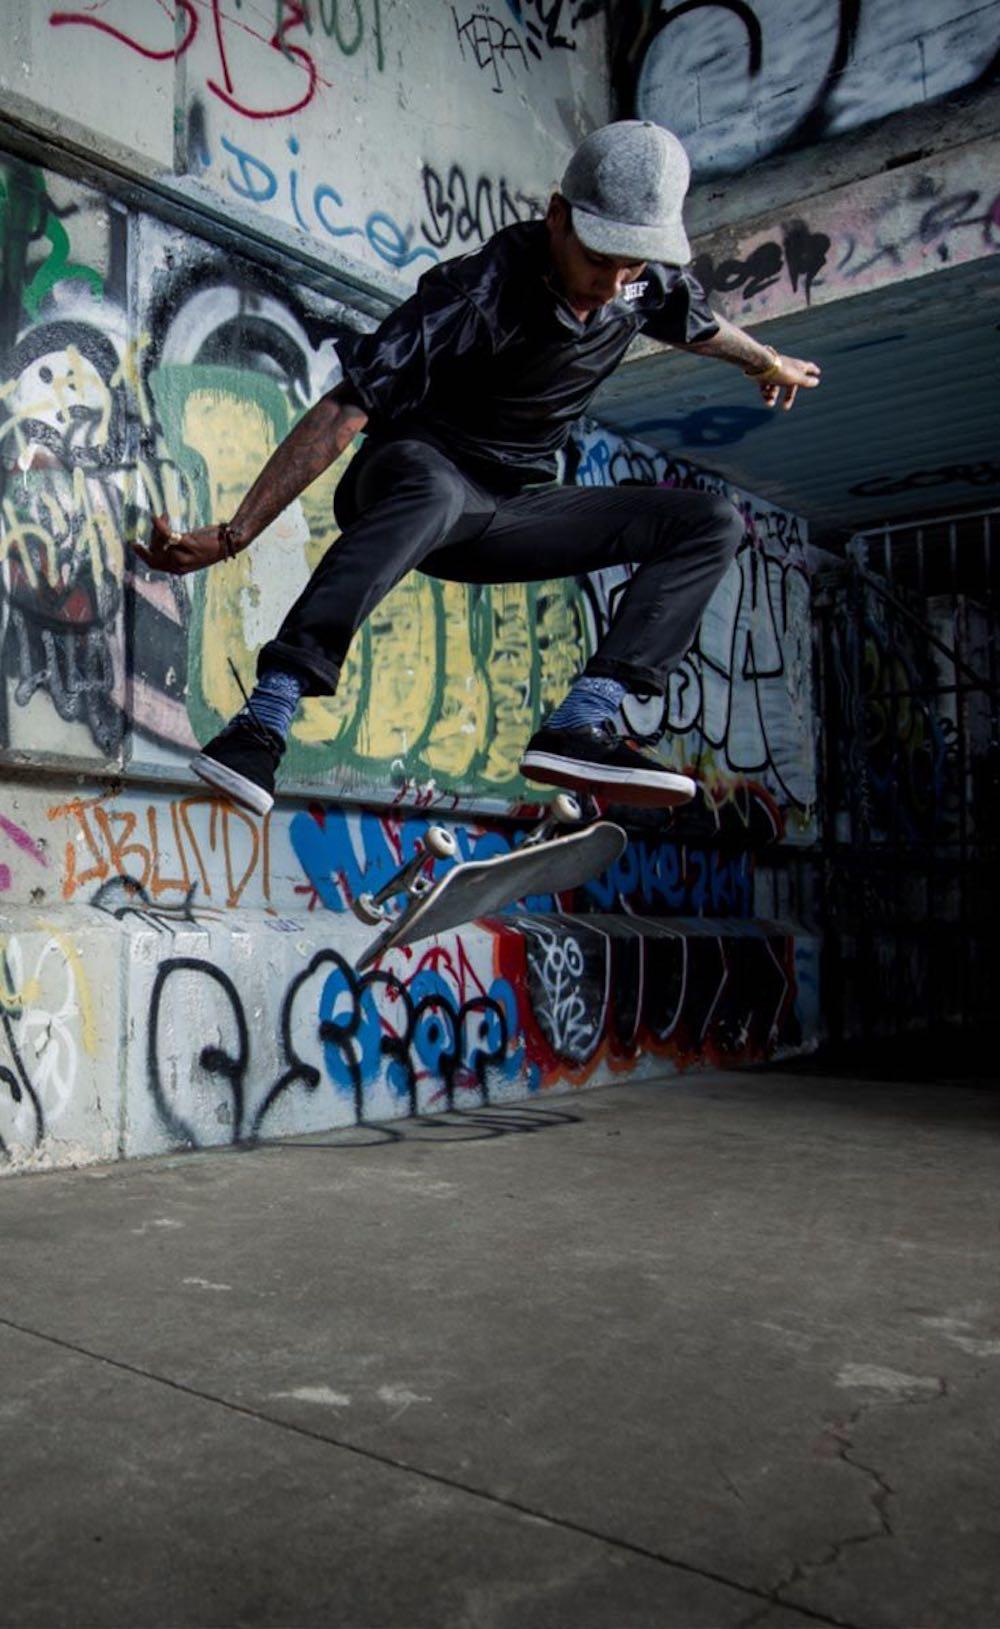 Introducing the boohooMAN x Boo Johnson Skate Capsule